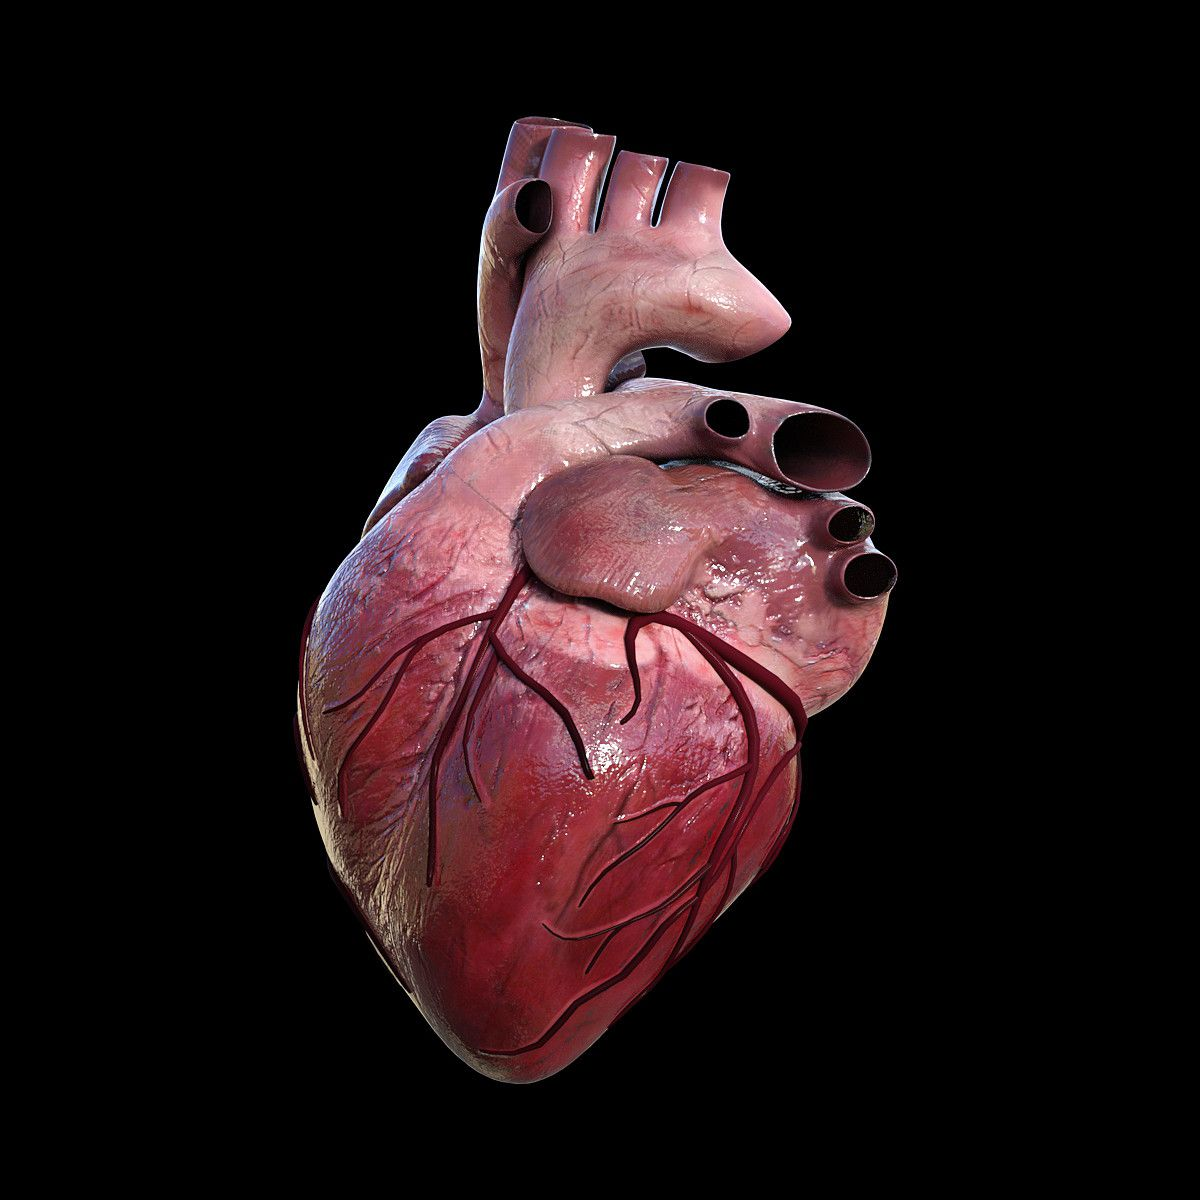 3d anatomy of heart